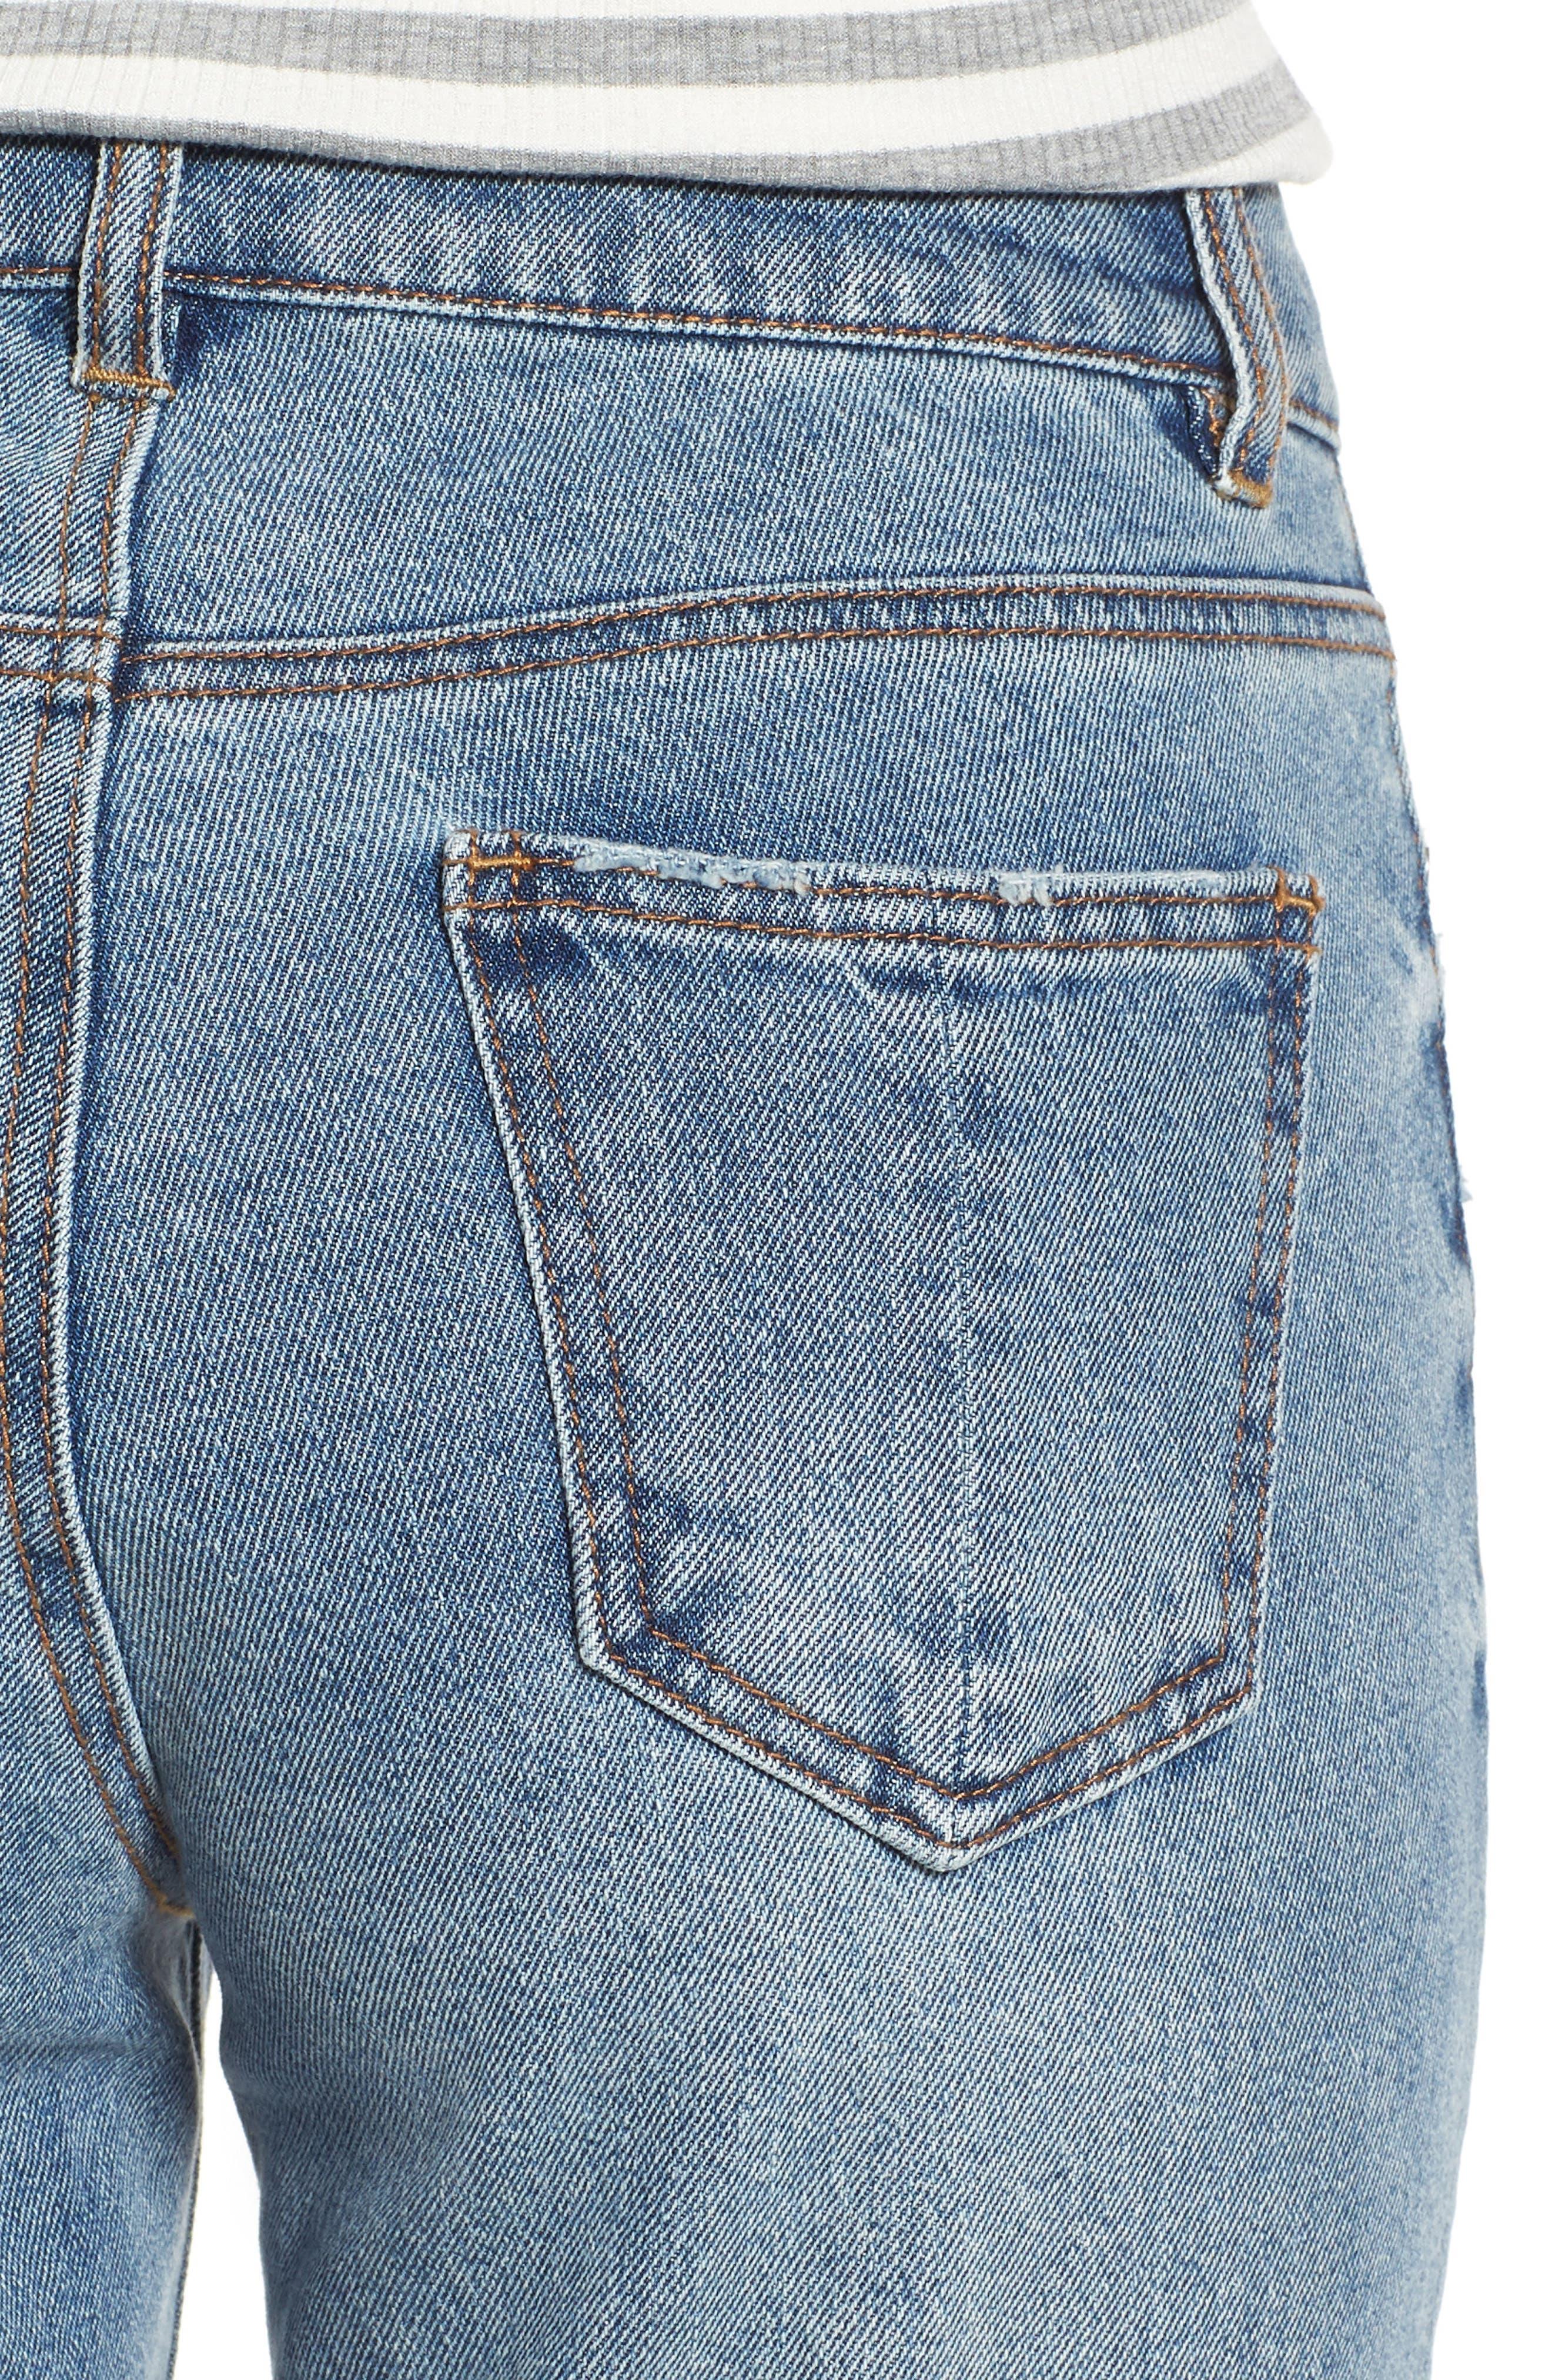 High Waist Skinny Jeans,                             Alternate thumbnail 4, color,                             Medium